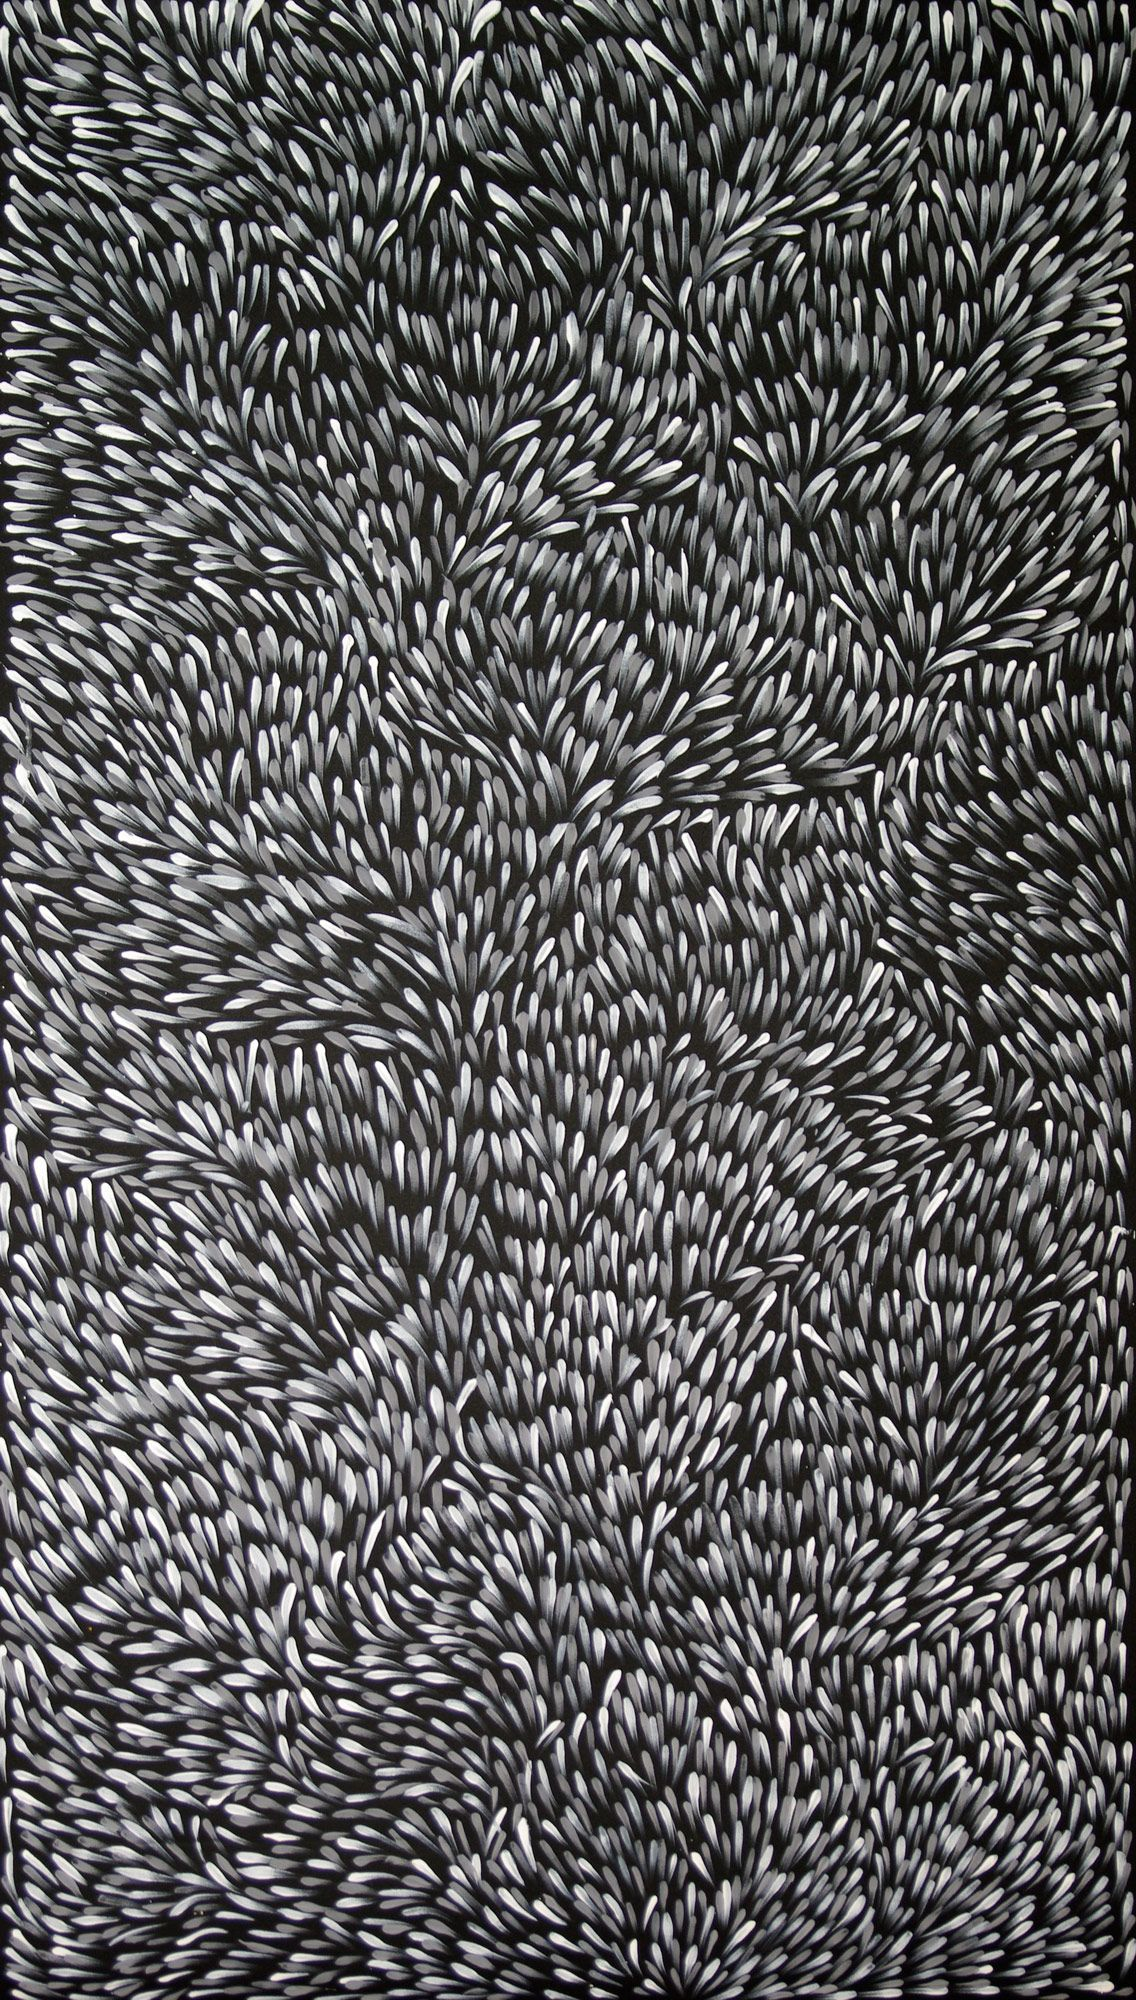 Australian Aboriginal Art Painting By Gloria Petyarre Bush Medicine